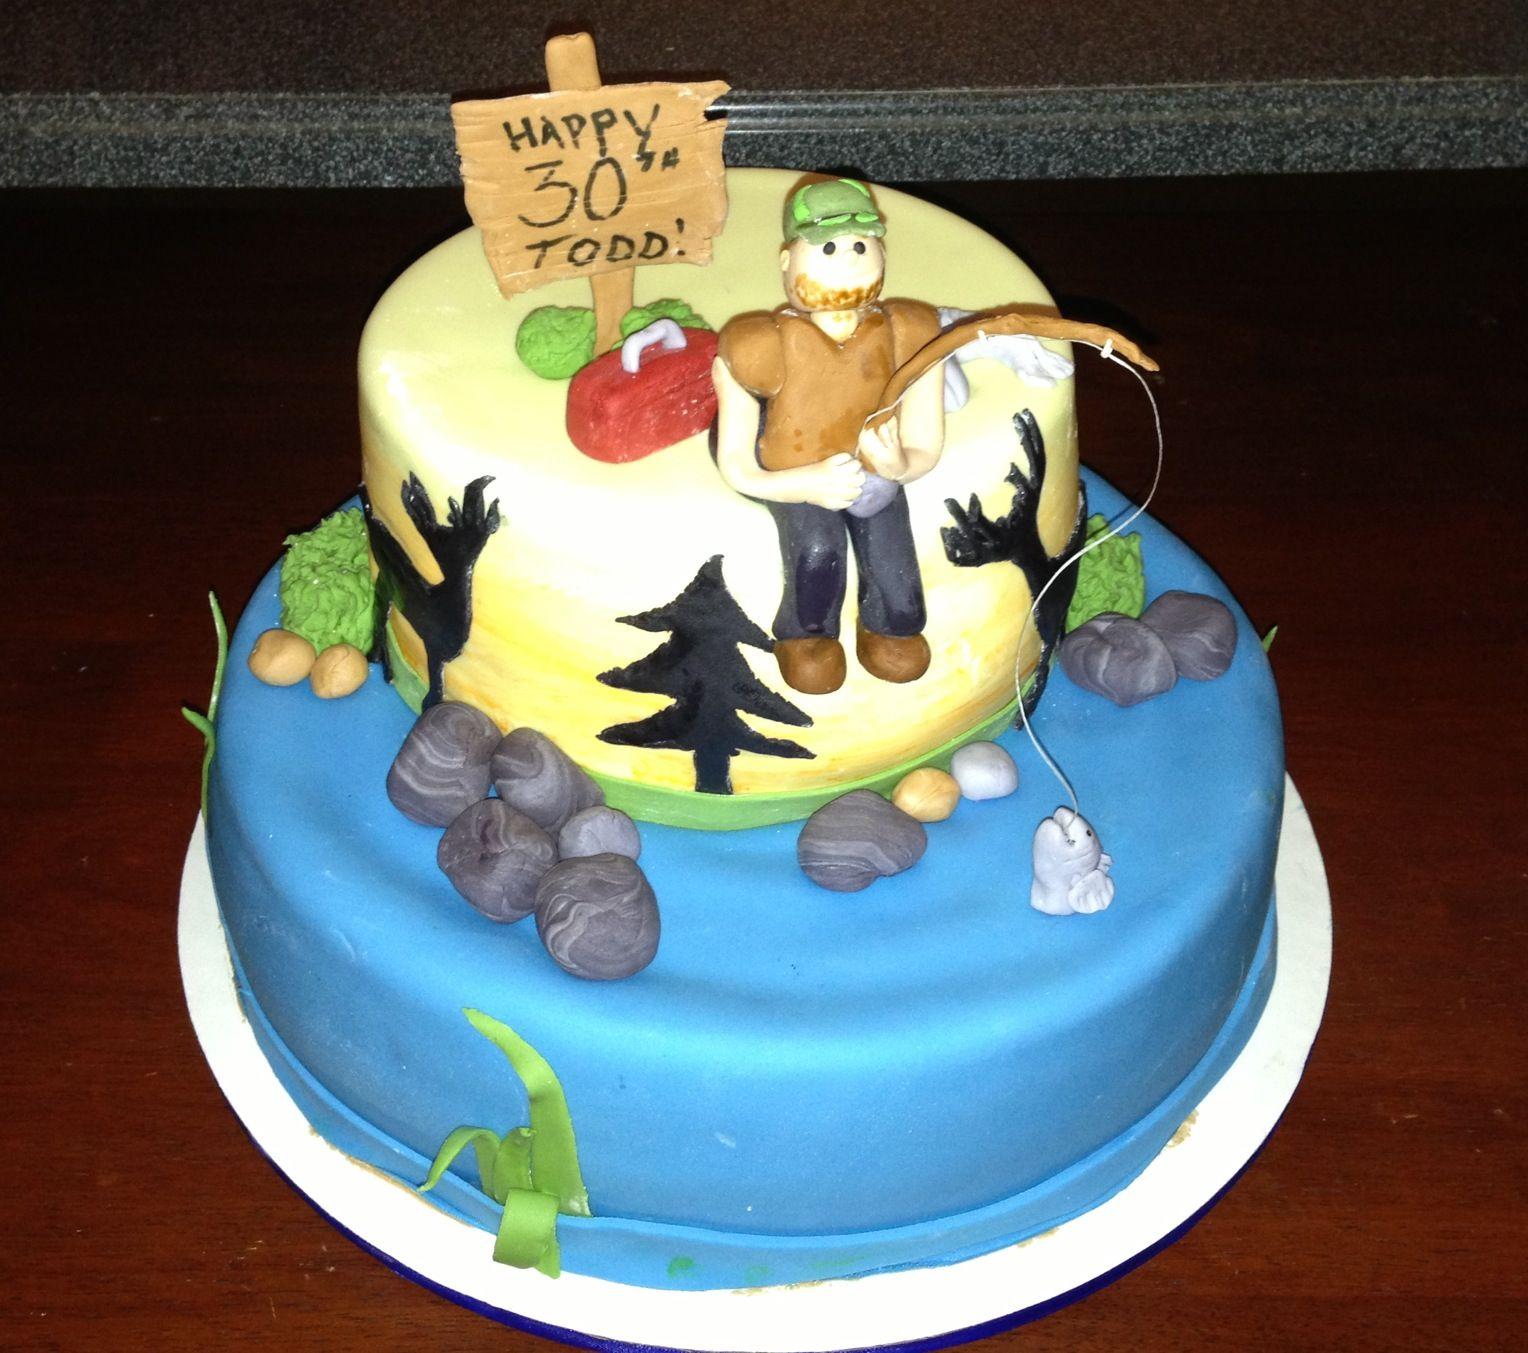 My husband's 30th Birthday cake!! New birthday cake